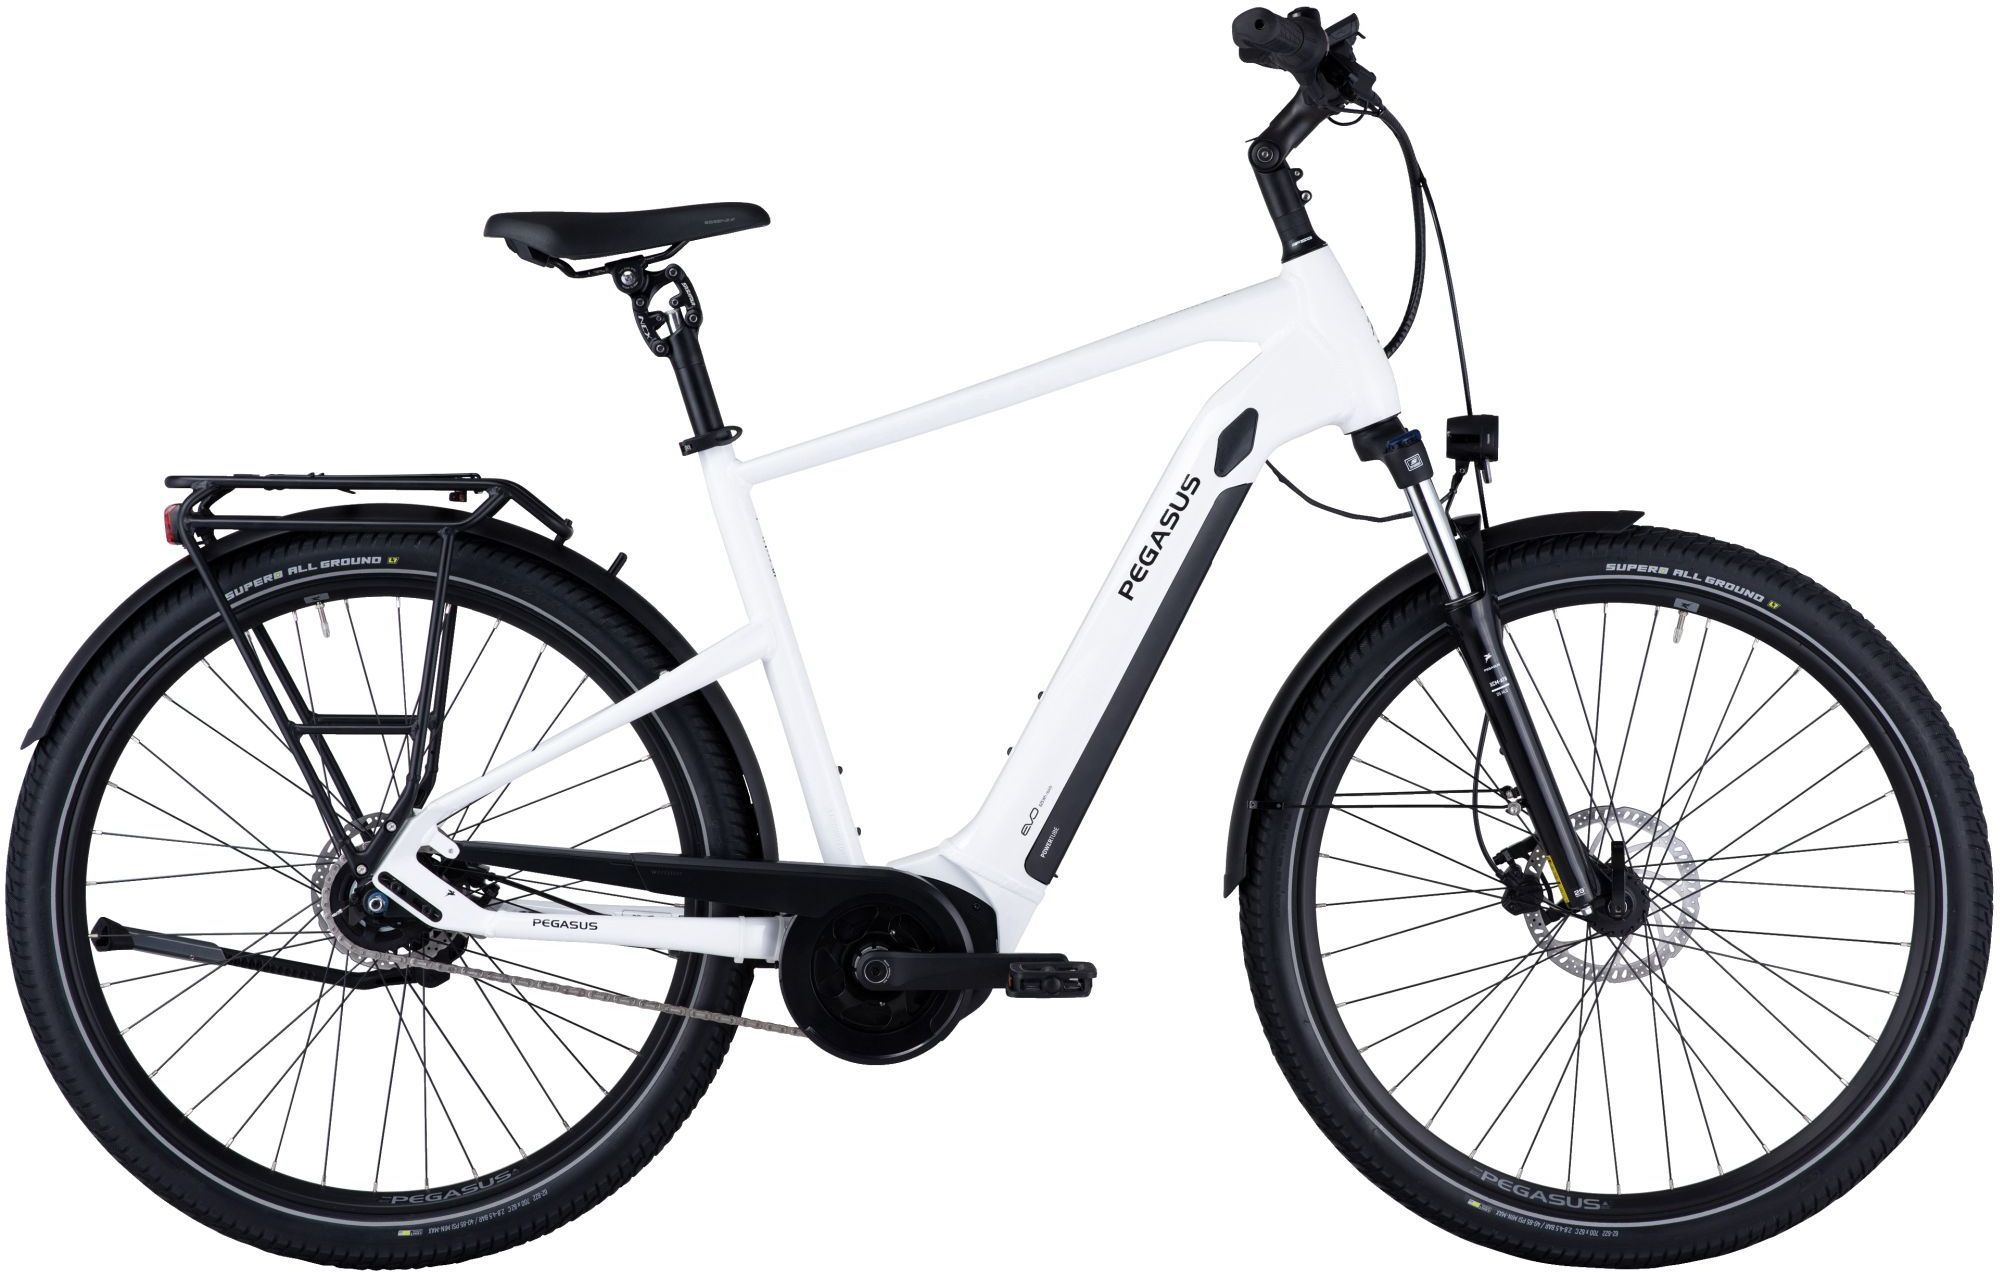 E-Bikes/Citybikes: Diamant  Savino EVO 5R Performance (400 Wh) 5 Gang Nabenschaltung Herrenfahrrad Diamant Modell 2021 28 Zoll 40 cm light grey